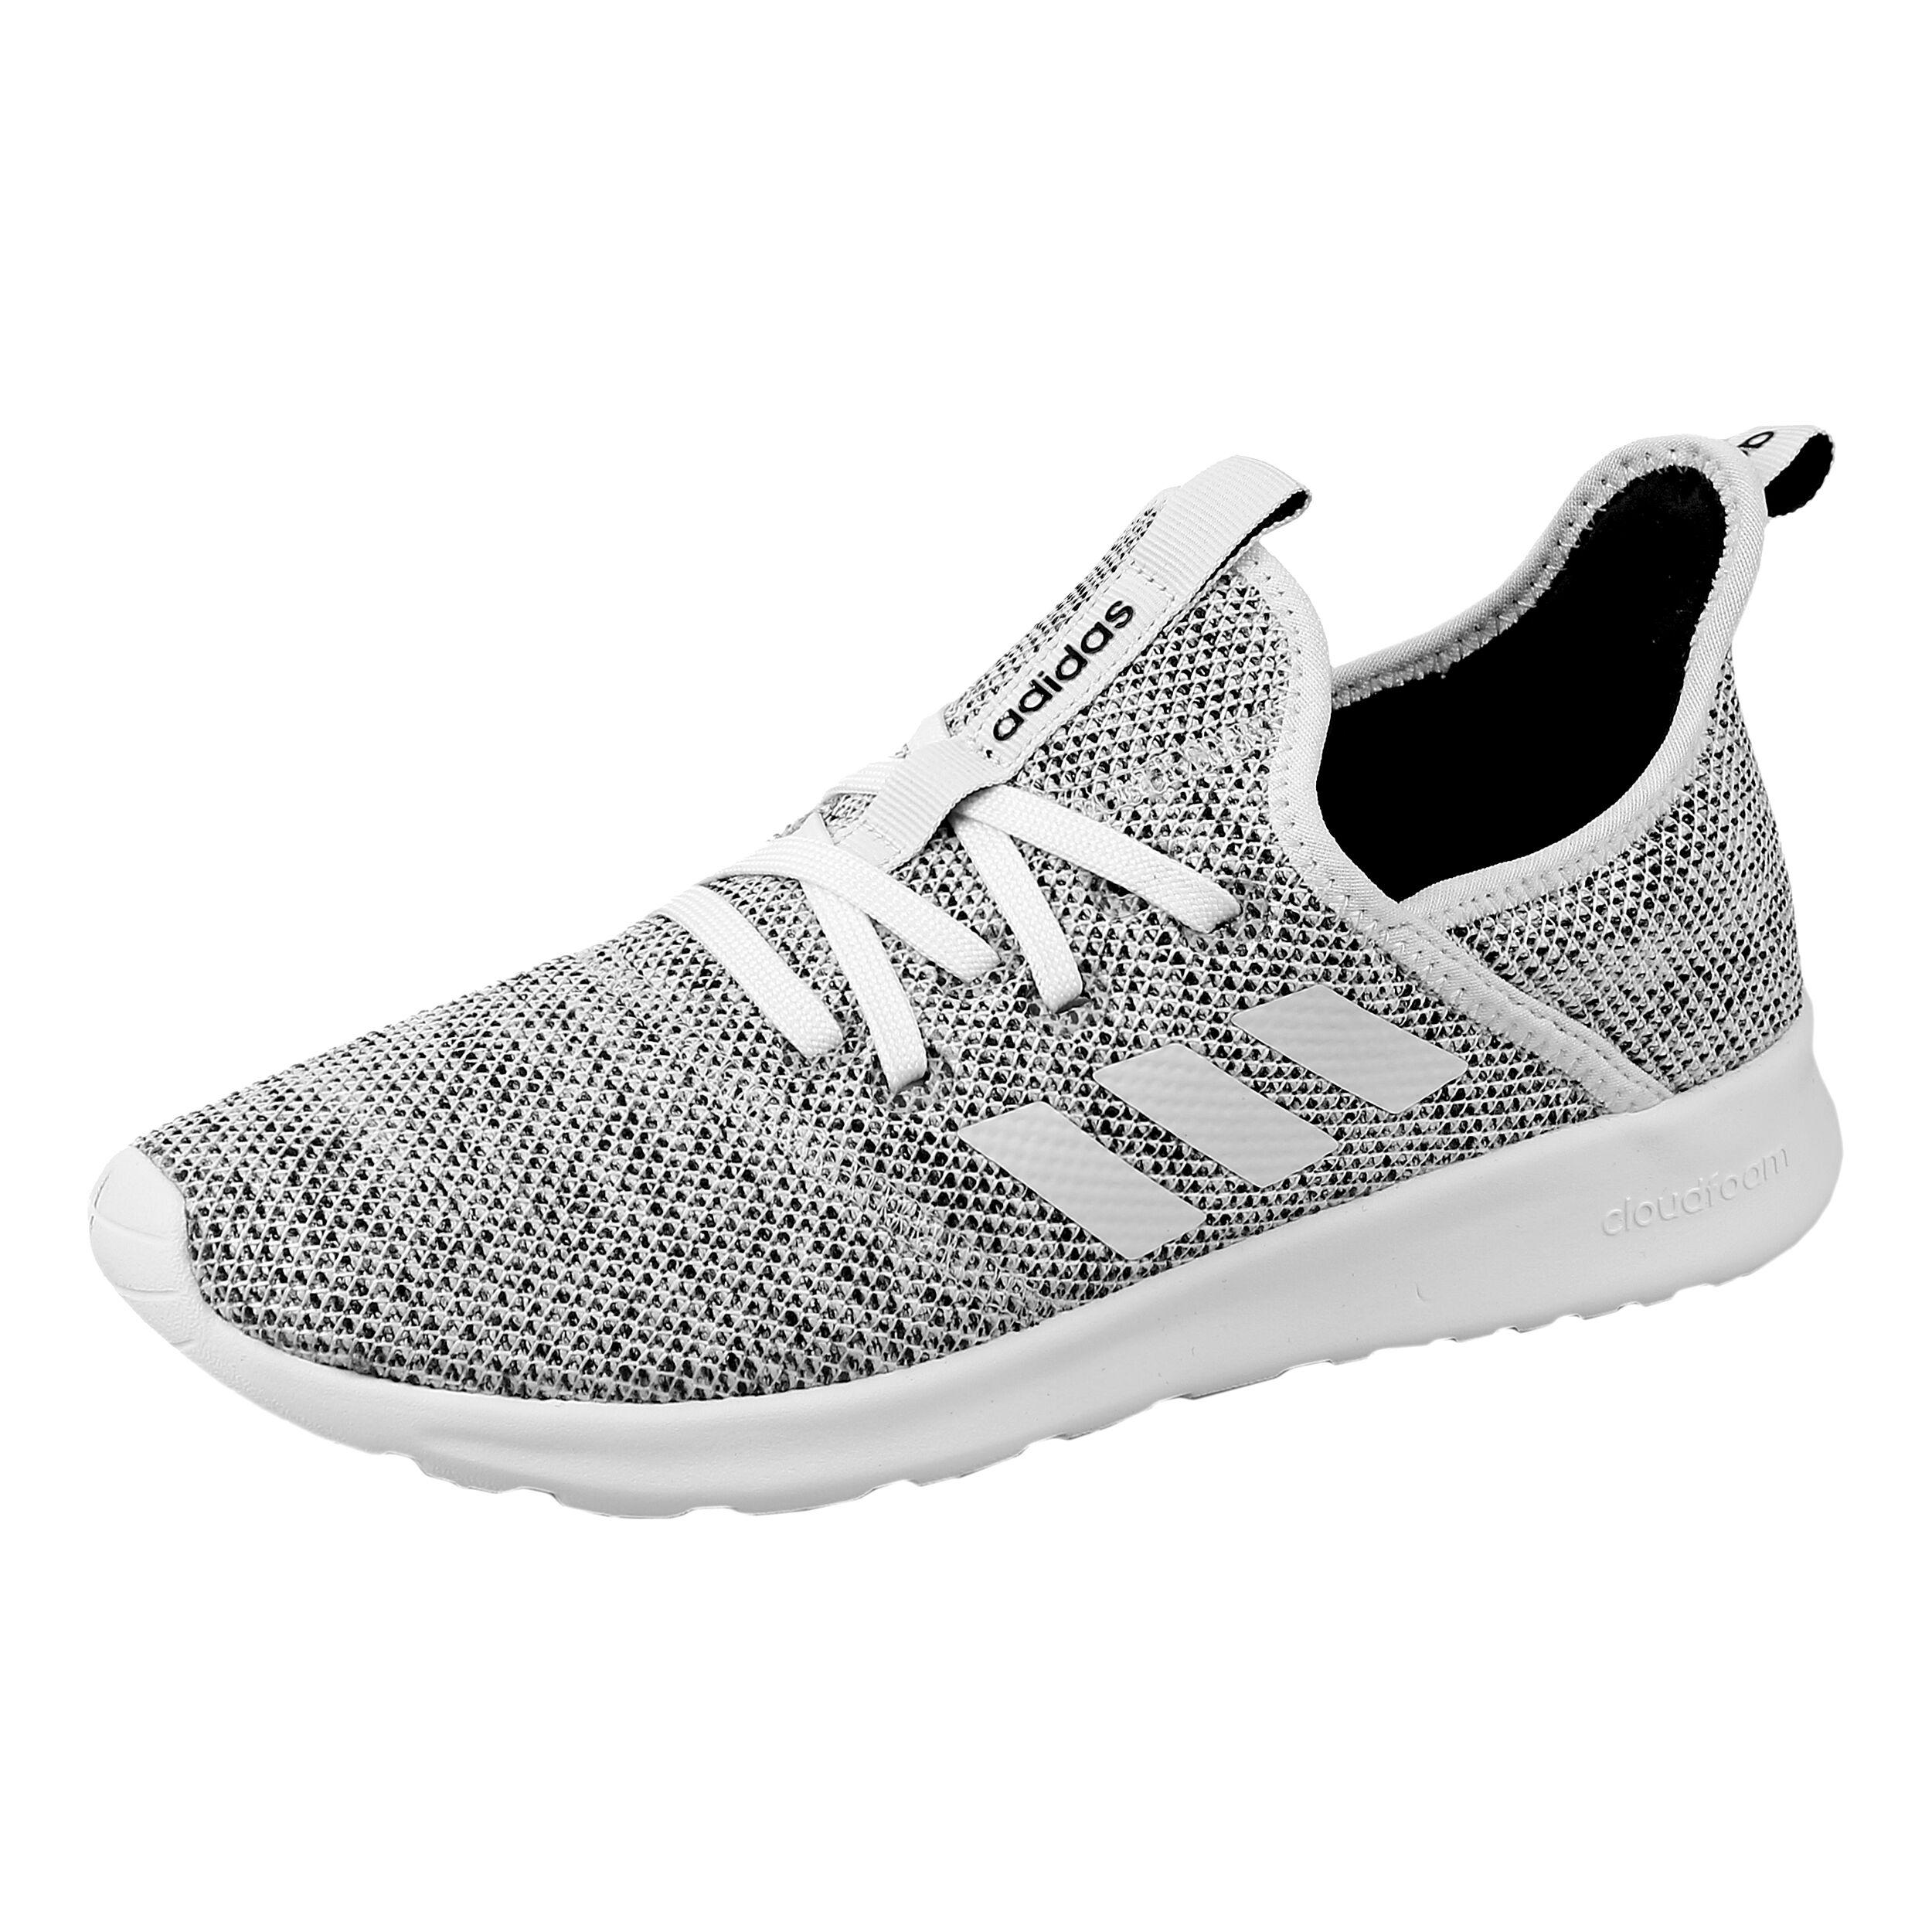 adidas NEO Cloudfoam Pure Sneaker Damen Hellgrau, Weiß